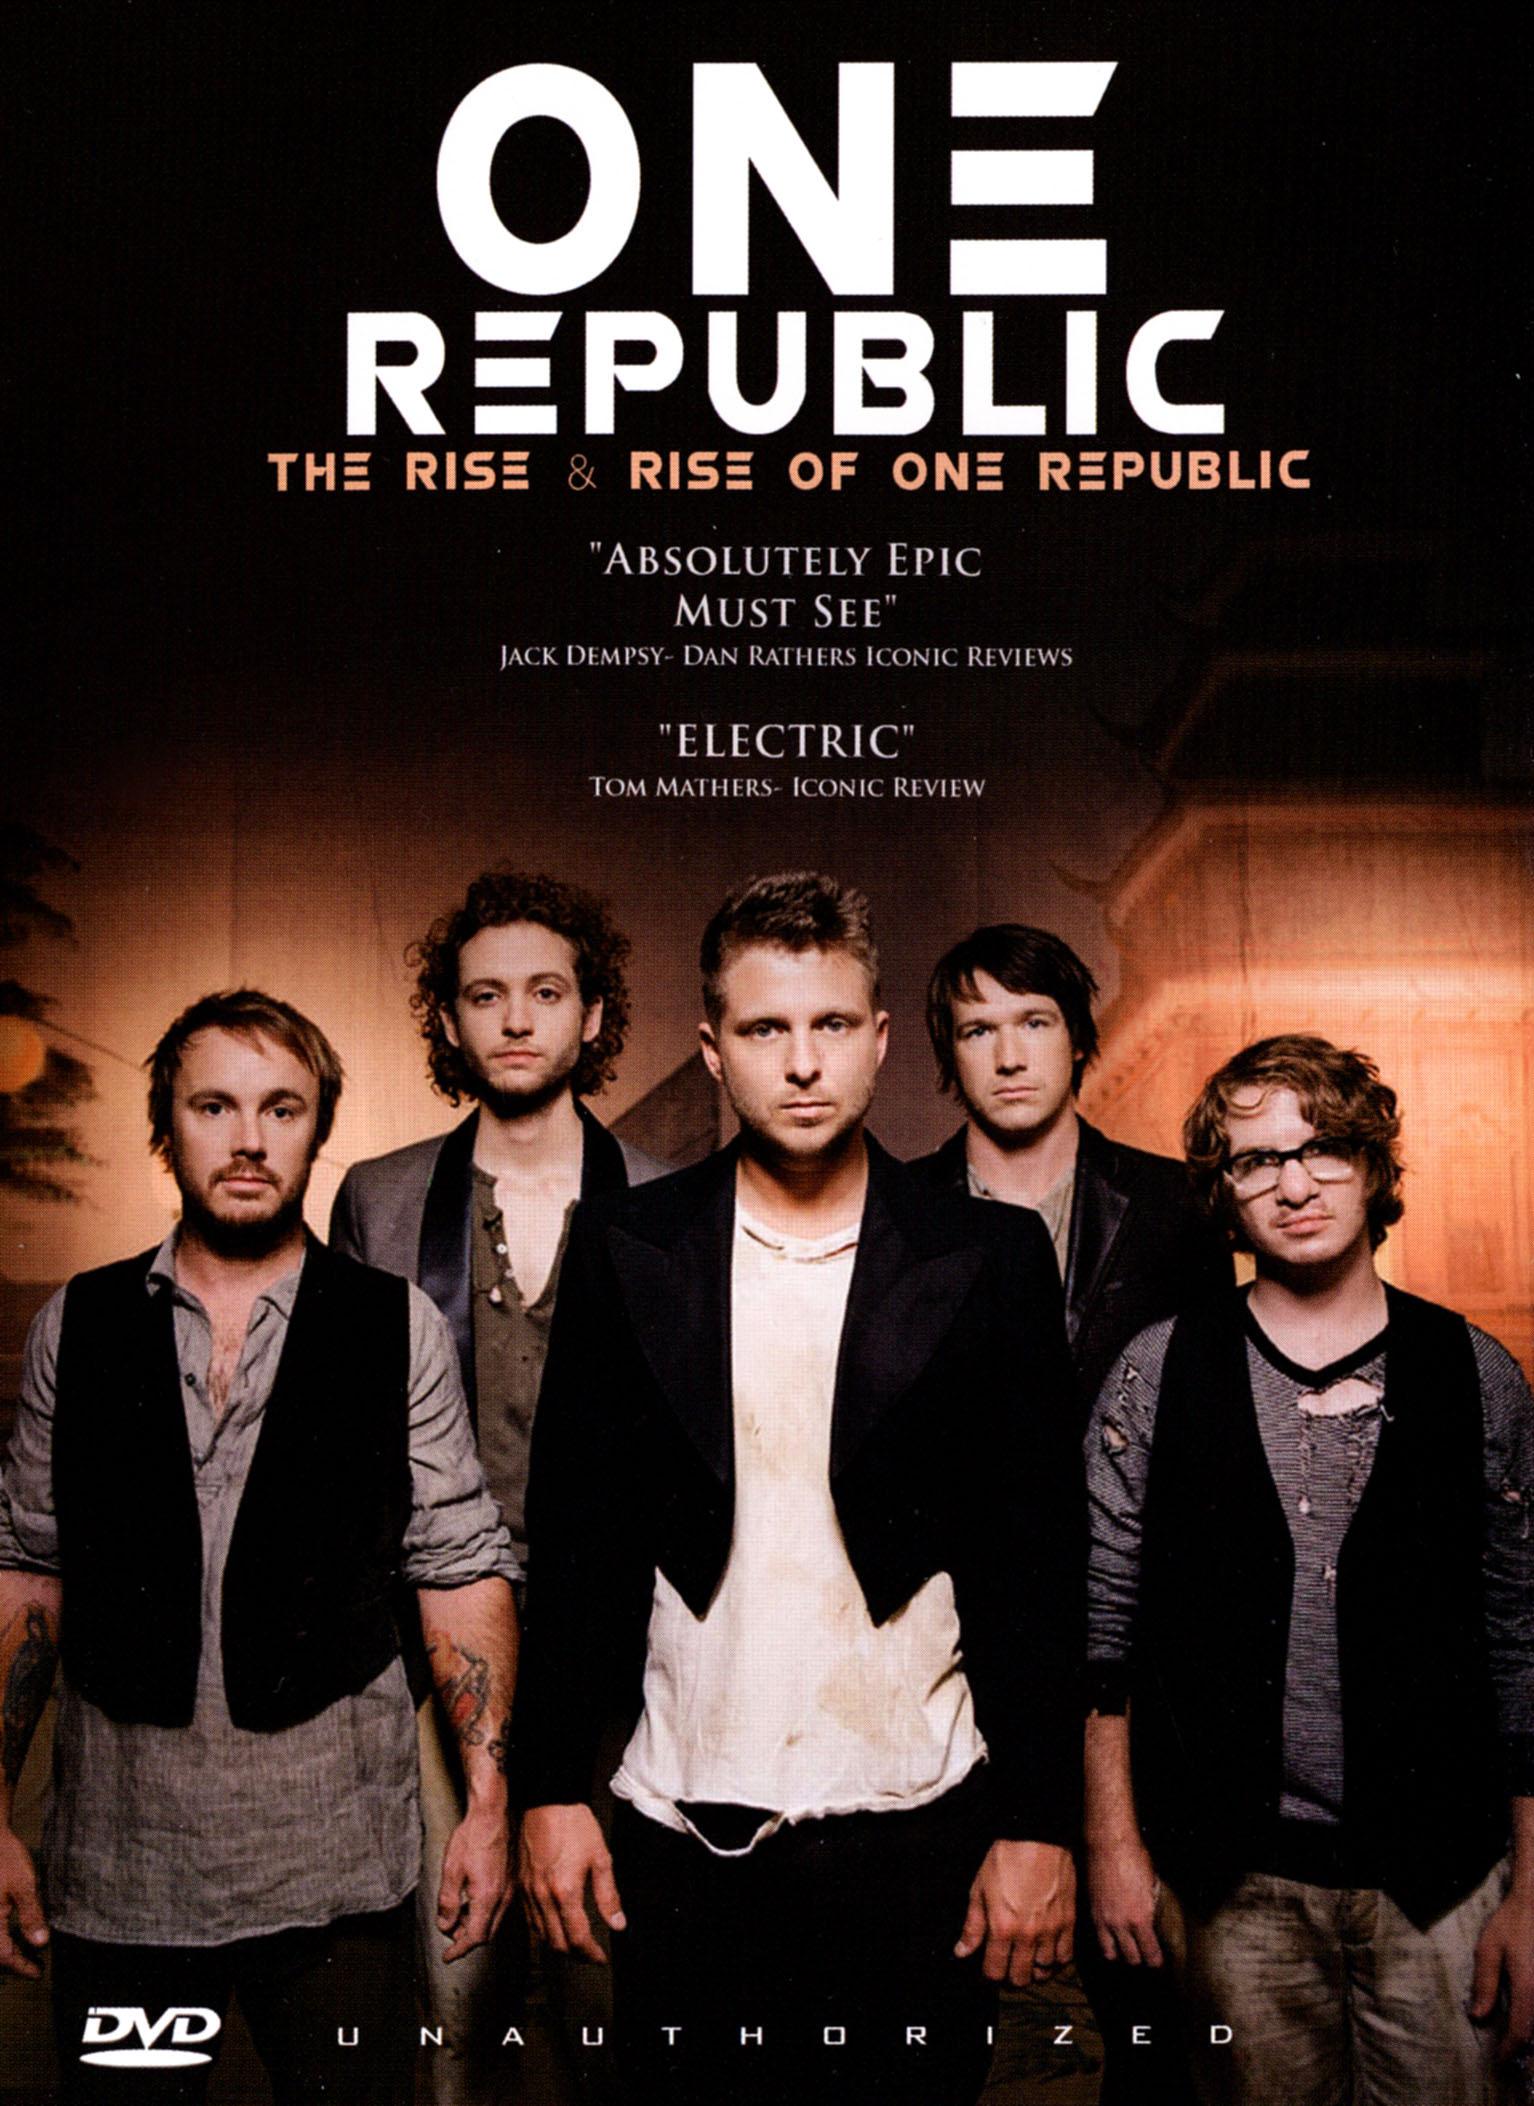 One Republic: The Rise & Rise of One Republic